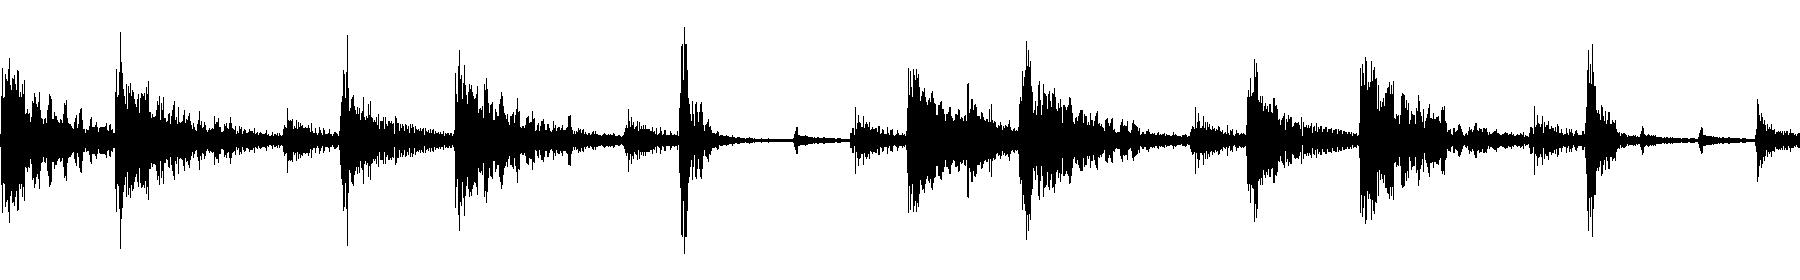 arab percussion loop 4